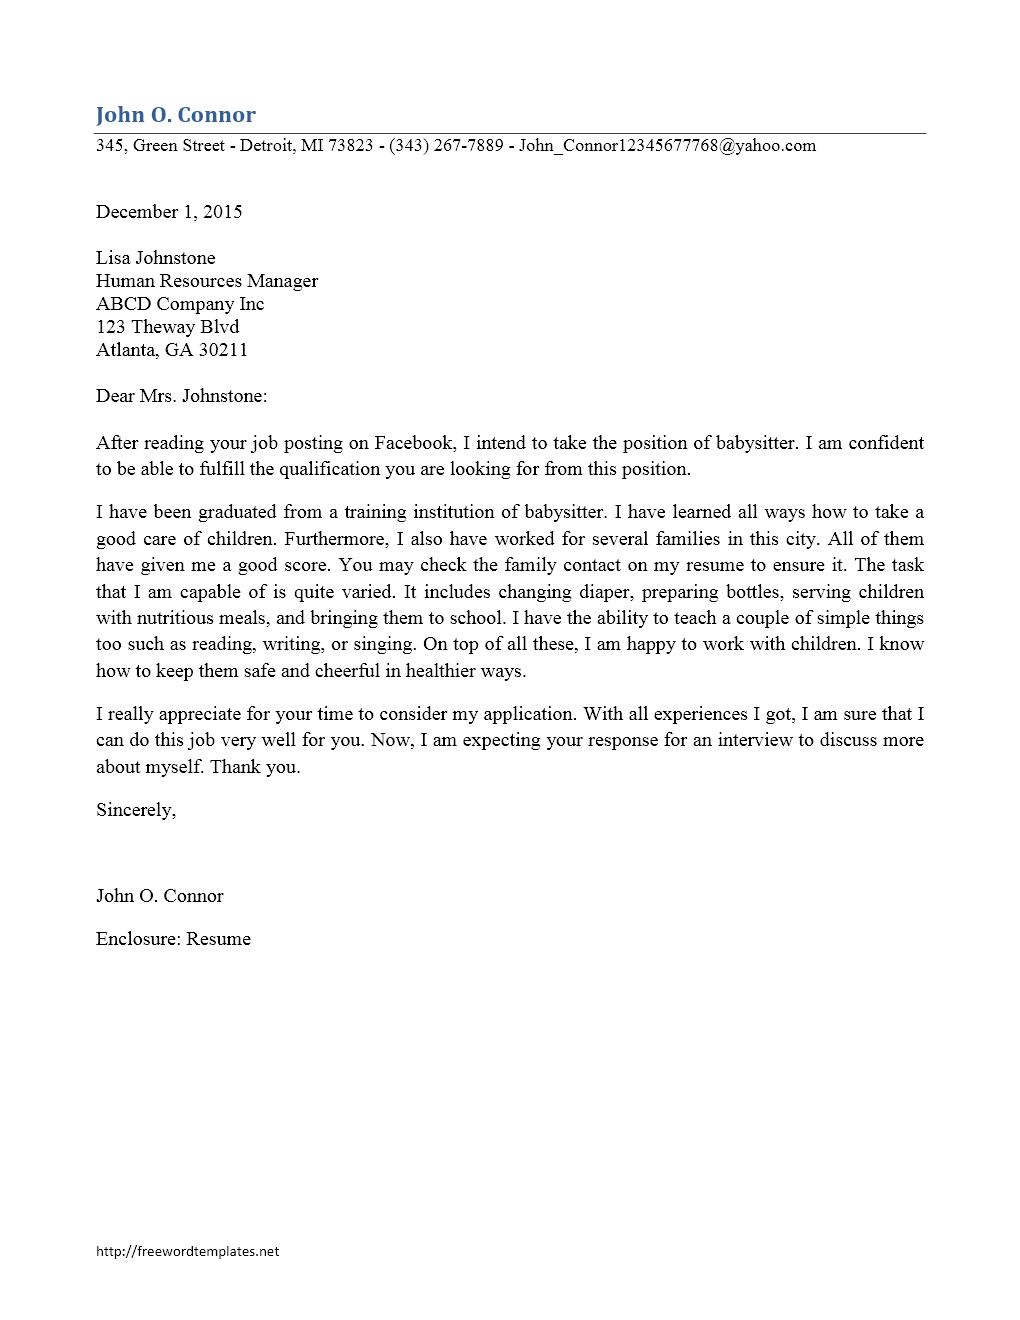 Cover Letter For Babysitting Job - Professional Babysitting Cover ...